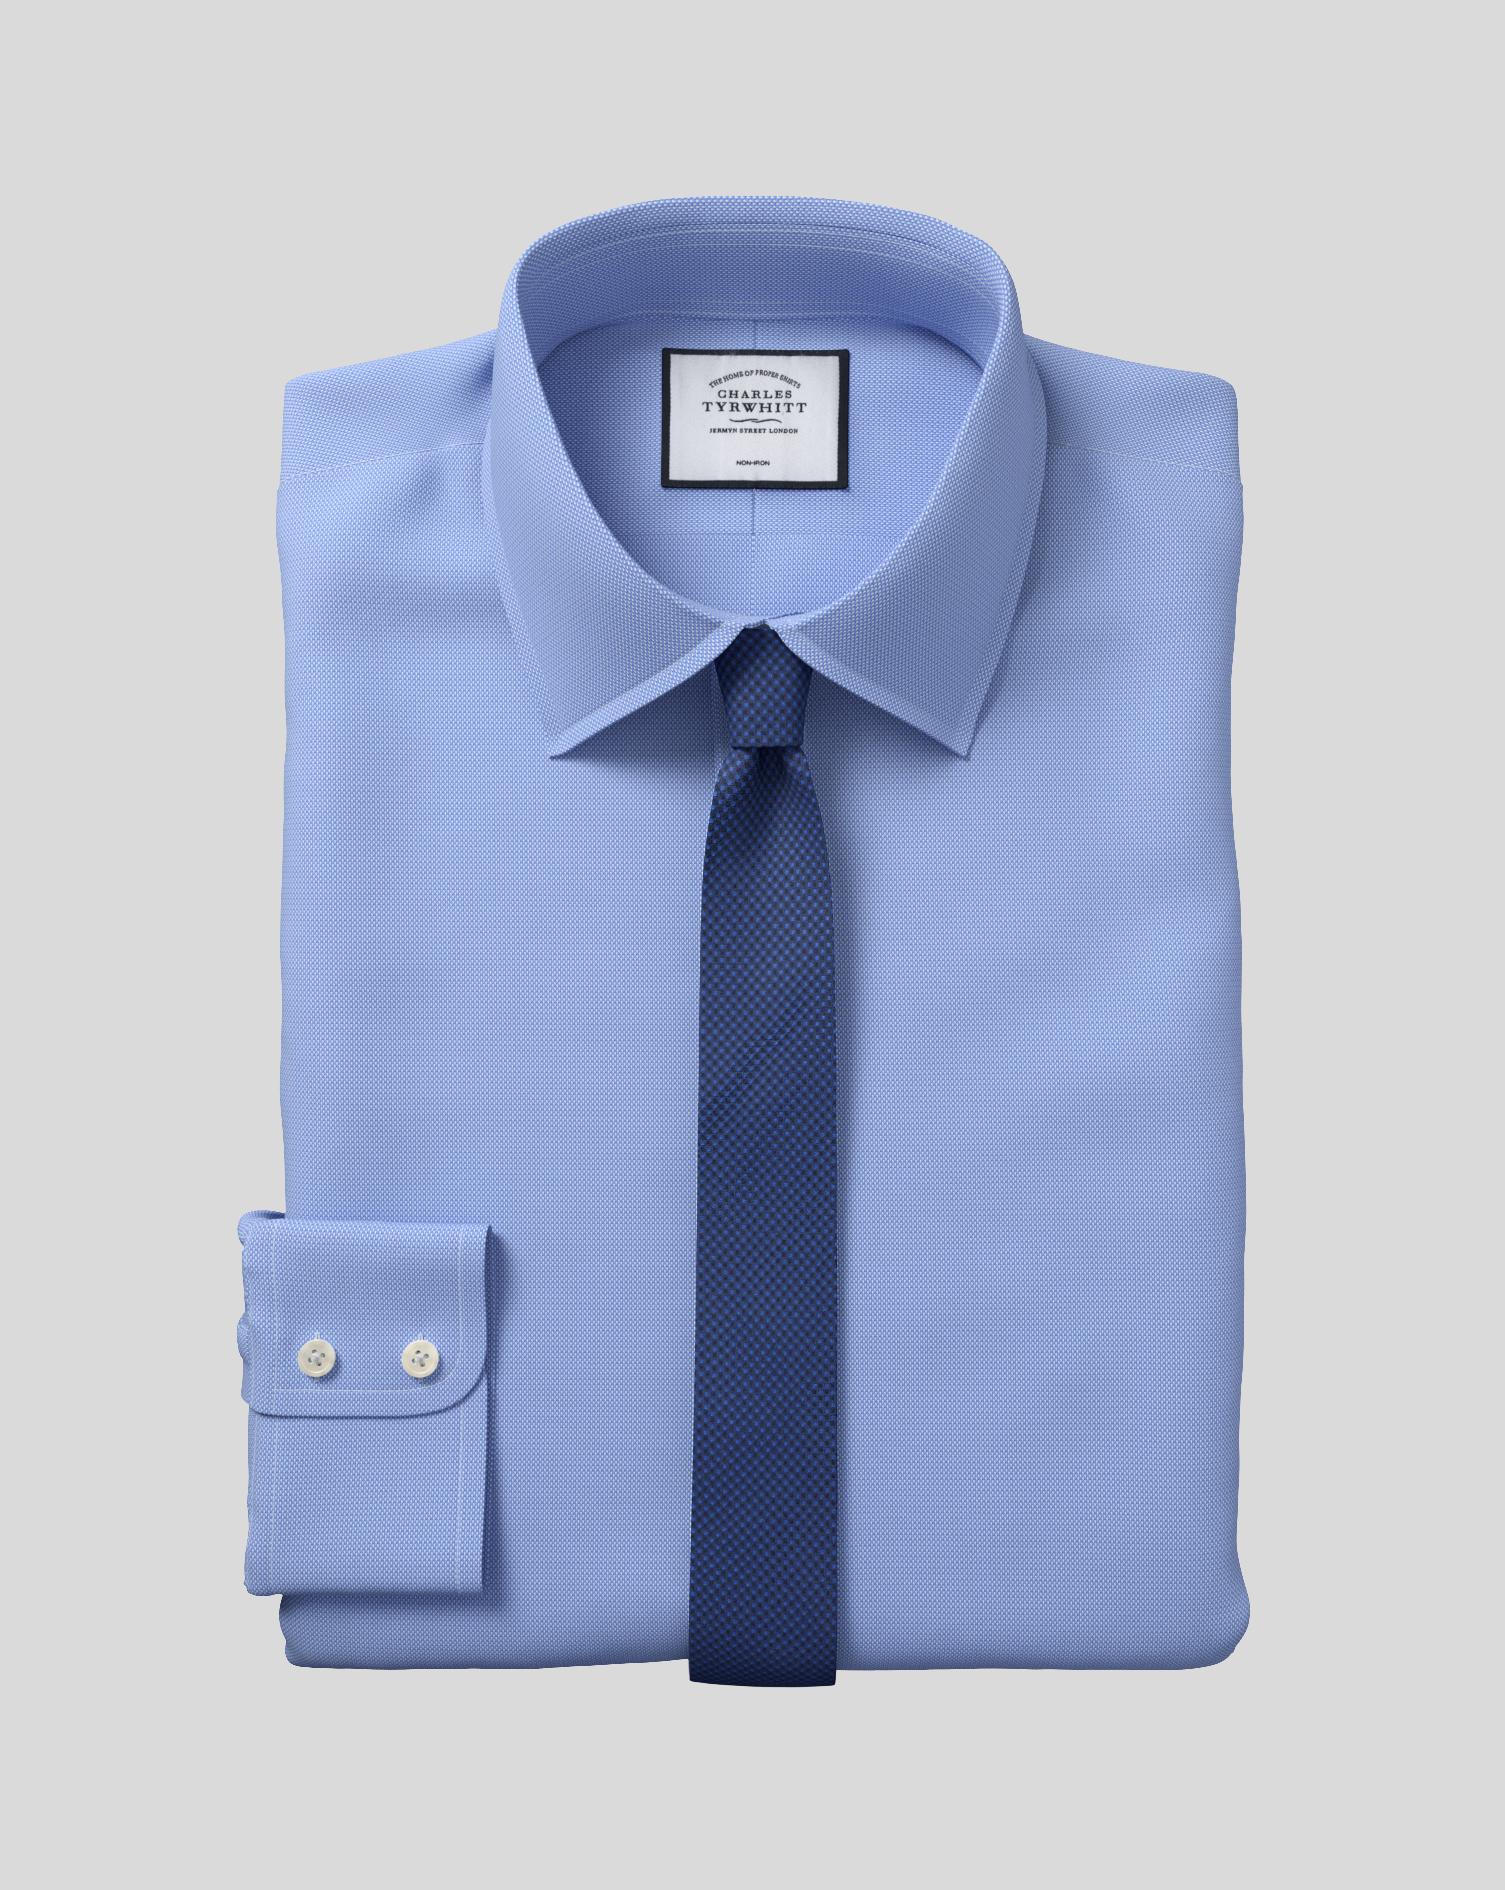 Extra Slim Fit Non Iron Royal Panama Blue Shirt Charles